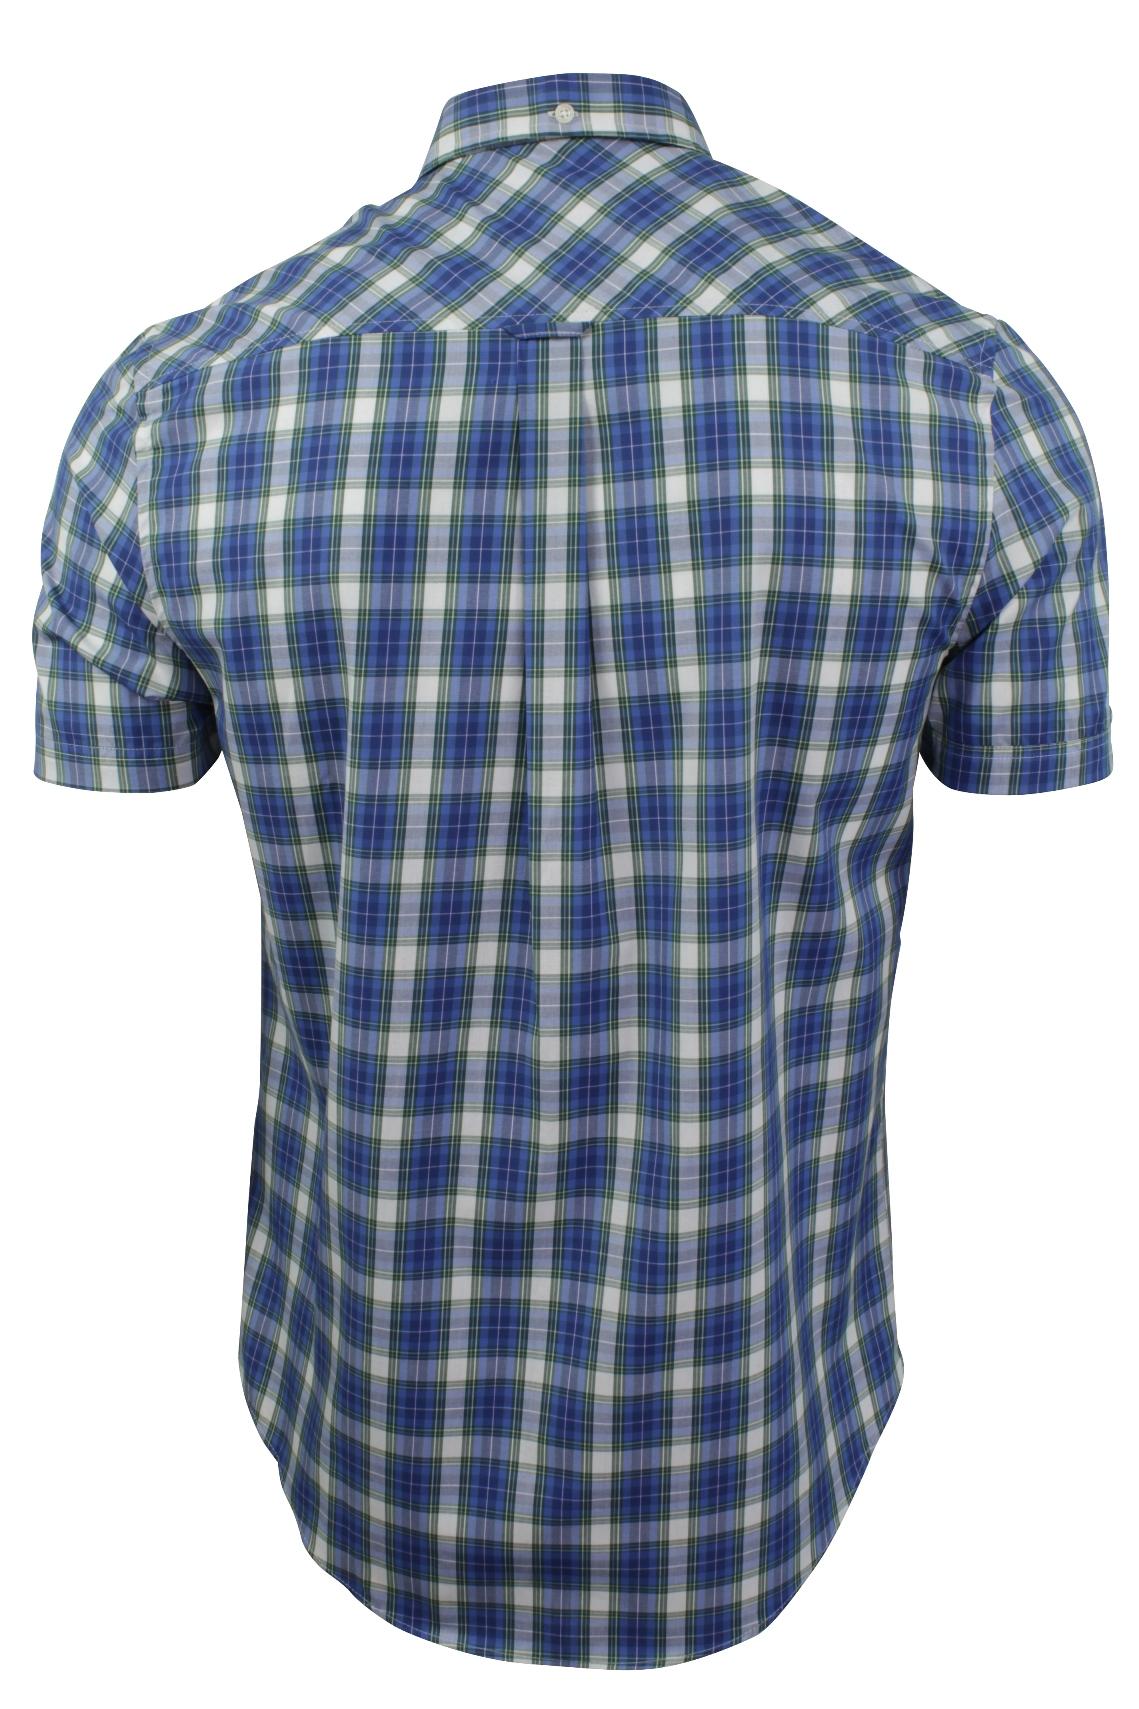 Mens-Tartan-Check-Shirt-by-Ben-Sherman-Short-Sleeved thumbnail 5